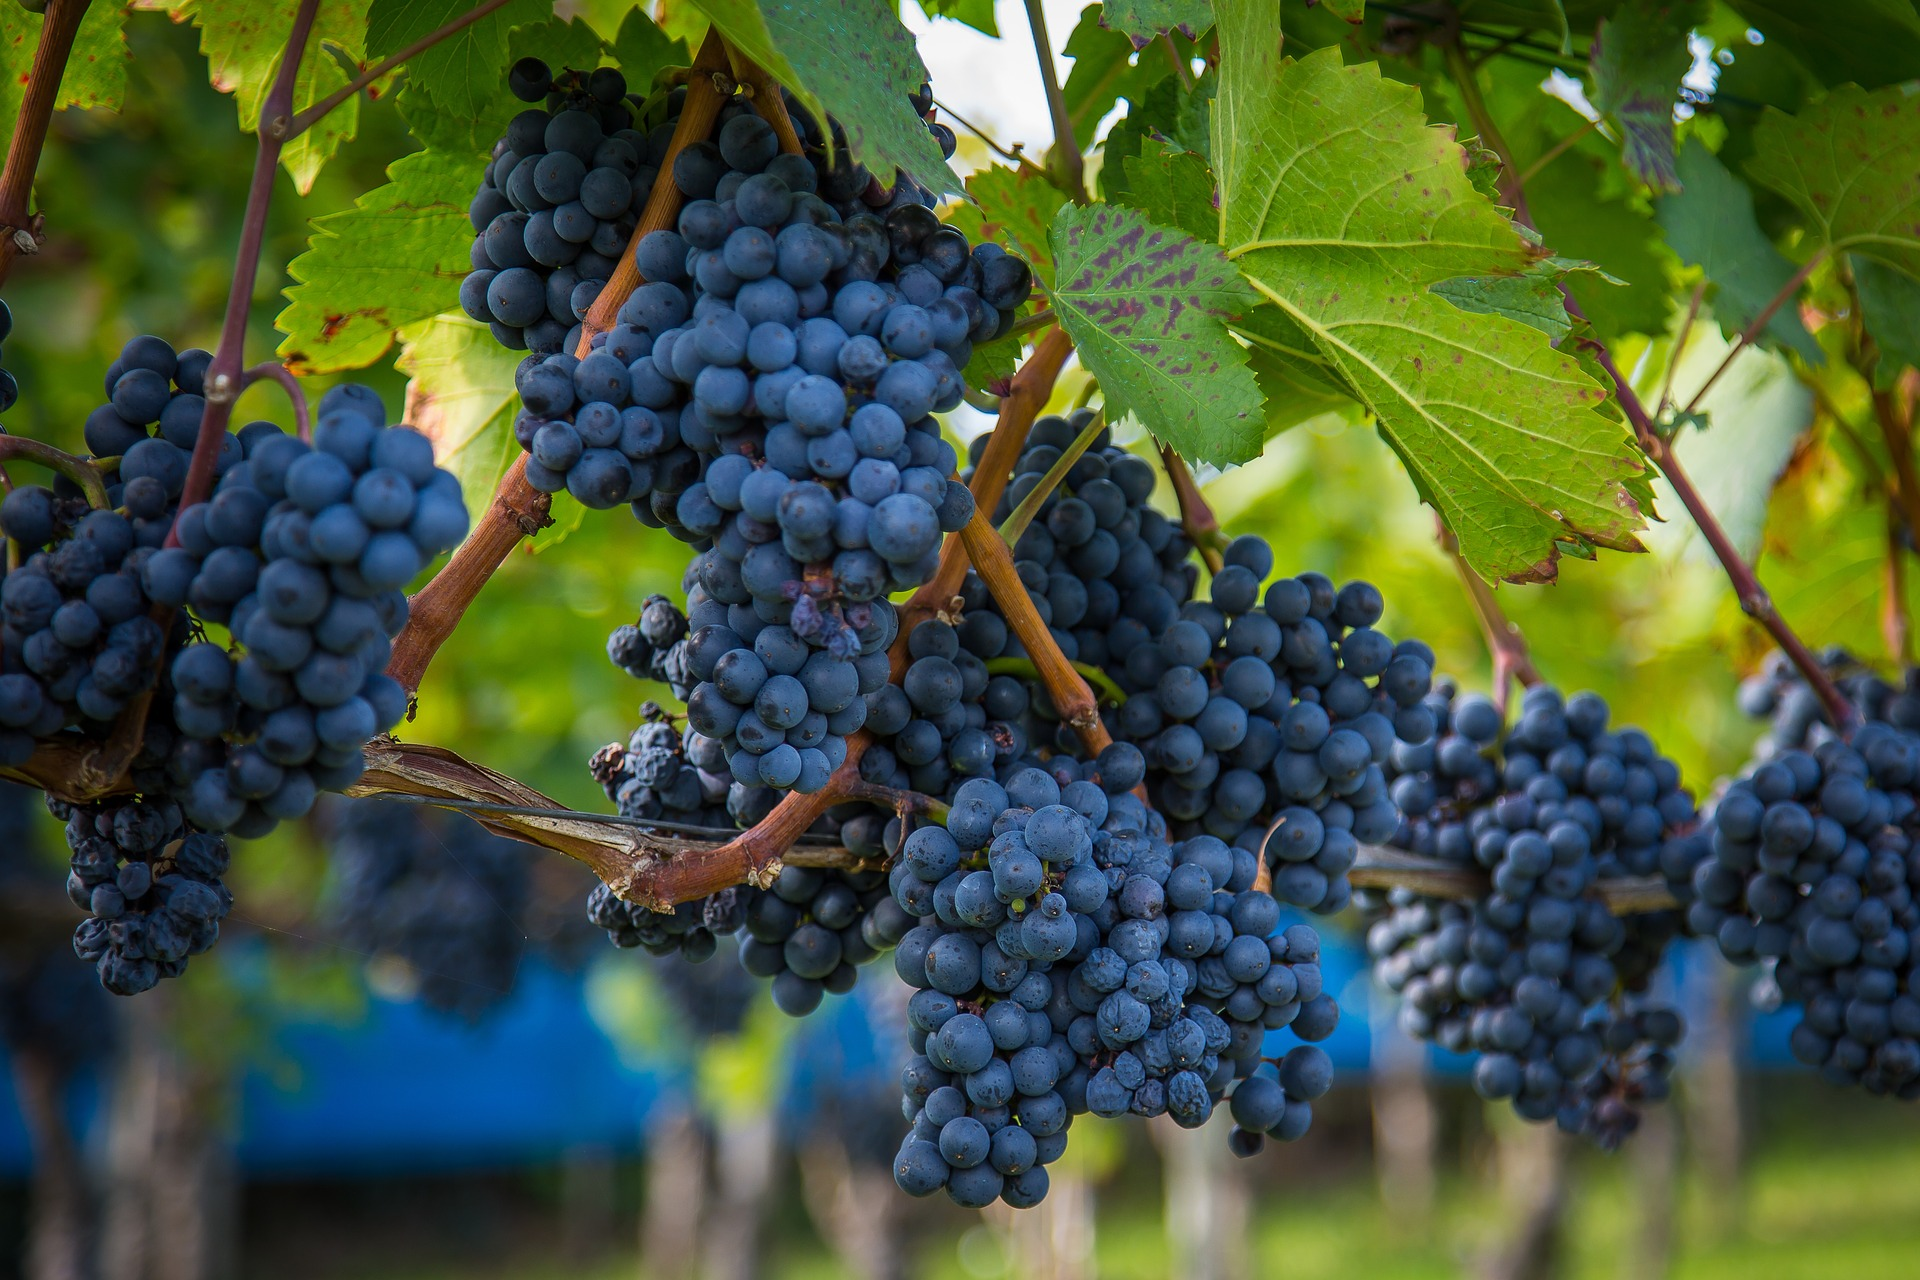 "Maxmann,  Wine Grapes  (30 September 2017). CC0 Creative Commons.  Alt text: A photo of grapes in a grape wine plantation                        Normal    0                false    false    false       EN-SG    X-NONE    X-NONE                                                                                                                                                                                                                                                                                                                                                                                                                                                                                                                        /* Style Definitions */  table.MsoNormalTable {mso-style-name:""Table Normal""; mso-tstyle-rowband-size:0; mso-tstyle-colband-size:0; mso-style-noshow:yes; mso-style-priority:99; mso-style-parent:""""; mso-padding-alt:0cm 5.4pt 0cm 5.4pt; mso-para-margin-top:0cm; mso-para-margin-right:0cm; mso-para-margin-bottom:10.0pt; mso-para-margin-left:0cm; line-height:115%; mso-pagination:widow-orphan; font-size:11.0pt; font-family:""Calibri"",""sans-serif""; mso-ascii-font-family:Calibri; mso-ascii-theme-font:minor-latin; mso-hansi-font-family:Calibri; mso-hansi-theme-font:minor-latin; mso-fareast-language:EN-US;}"